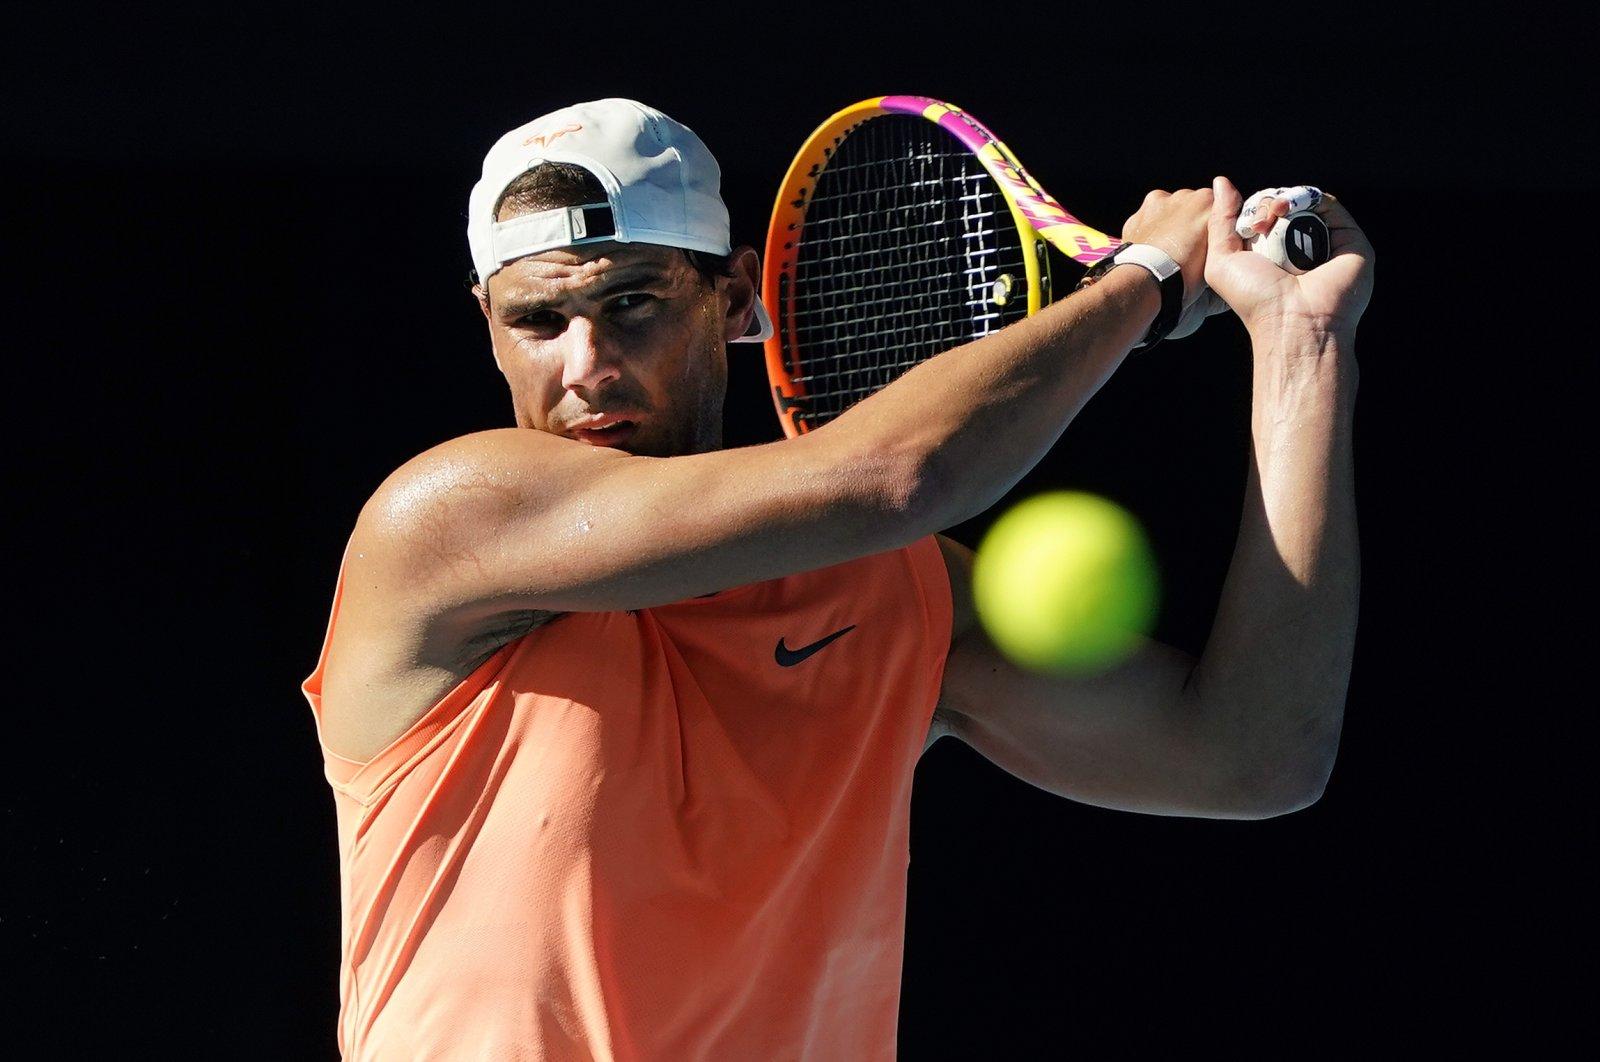 Spain's Rafael Nadal attends a practice session at Melbourne Park, Melbourne, Australia, Jan. 31, 2021. (EPA Photo)